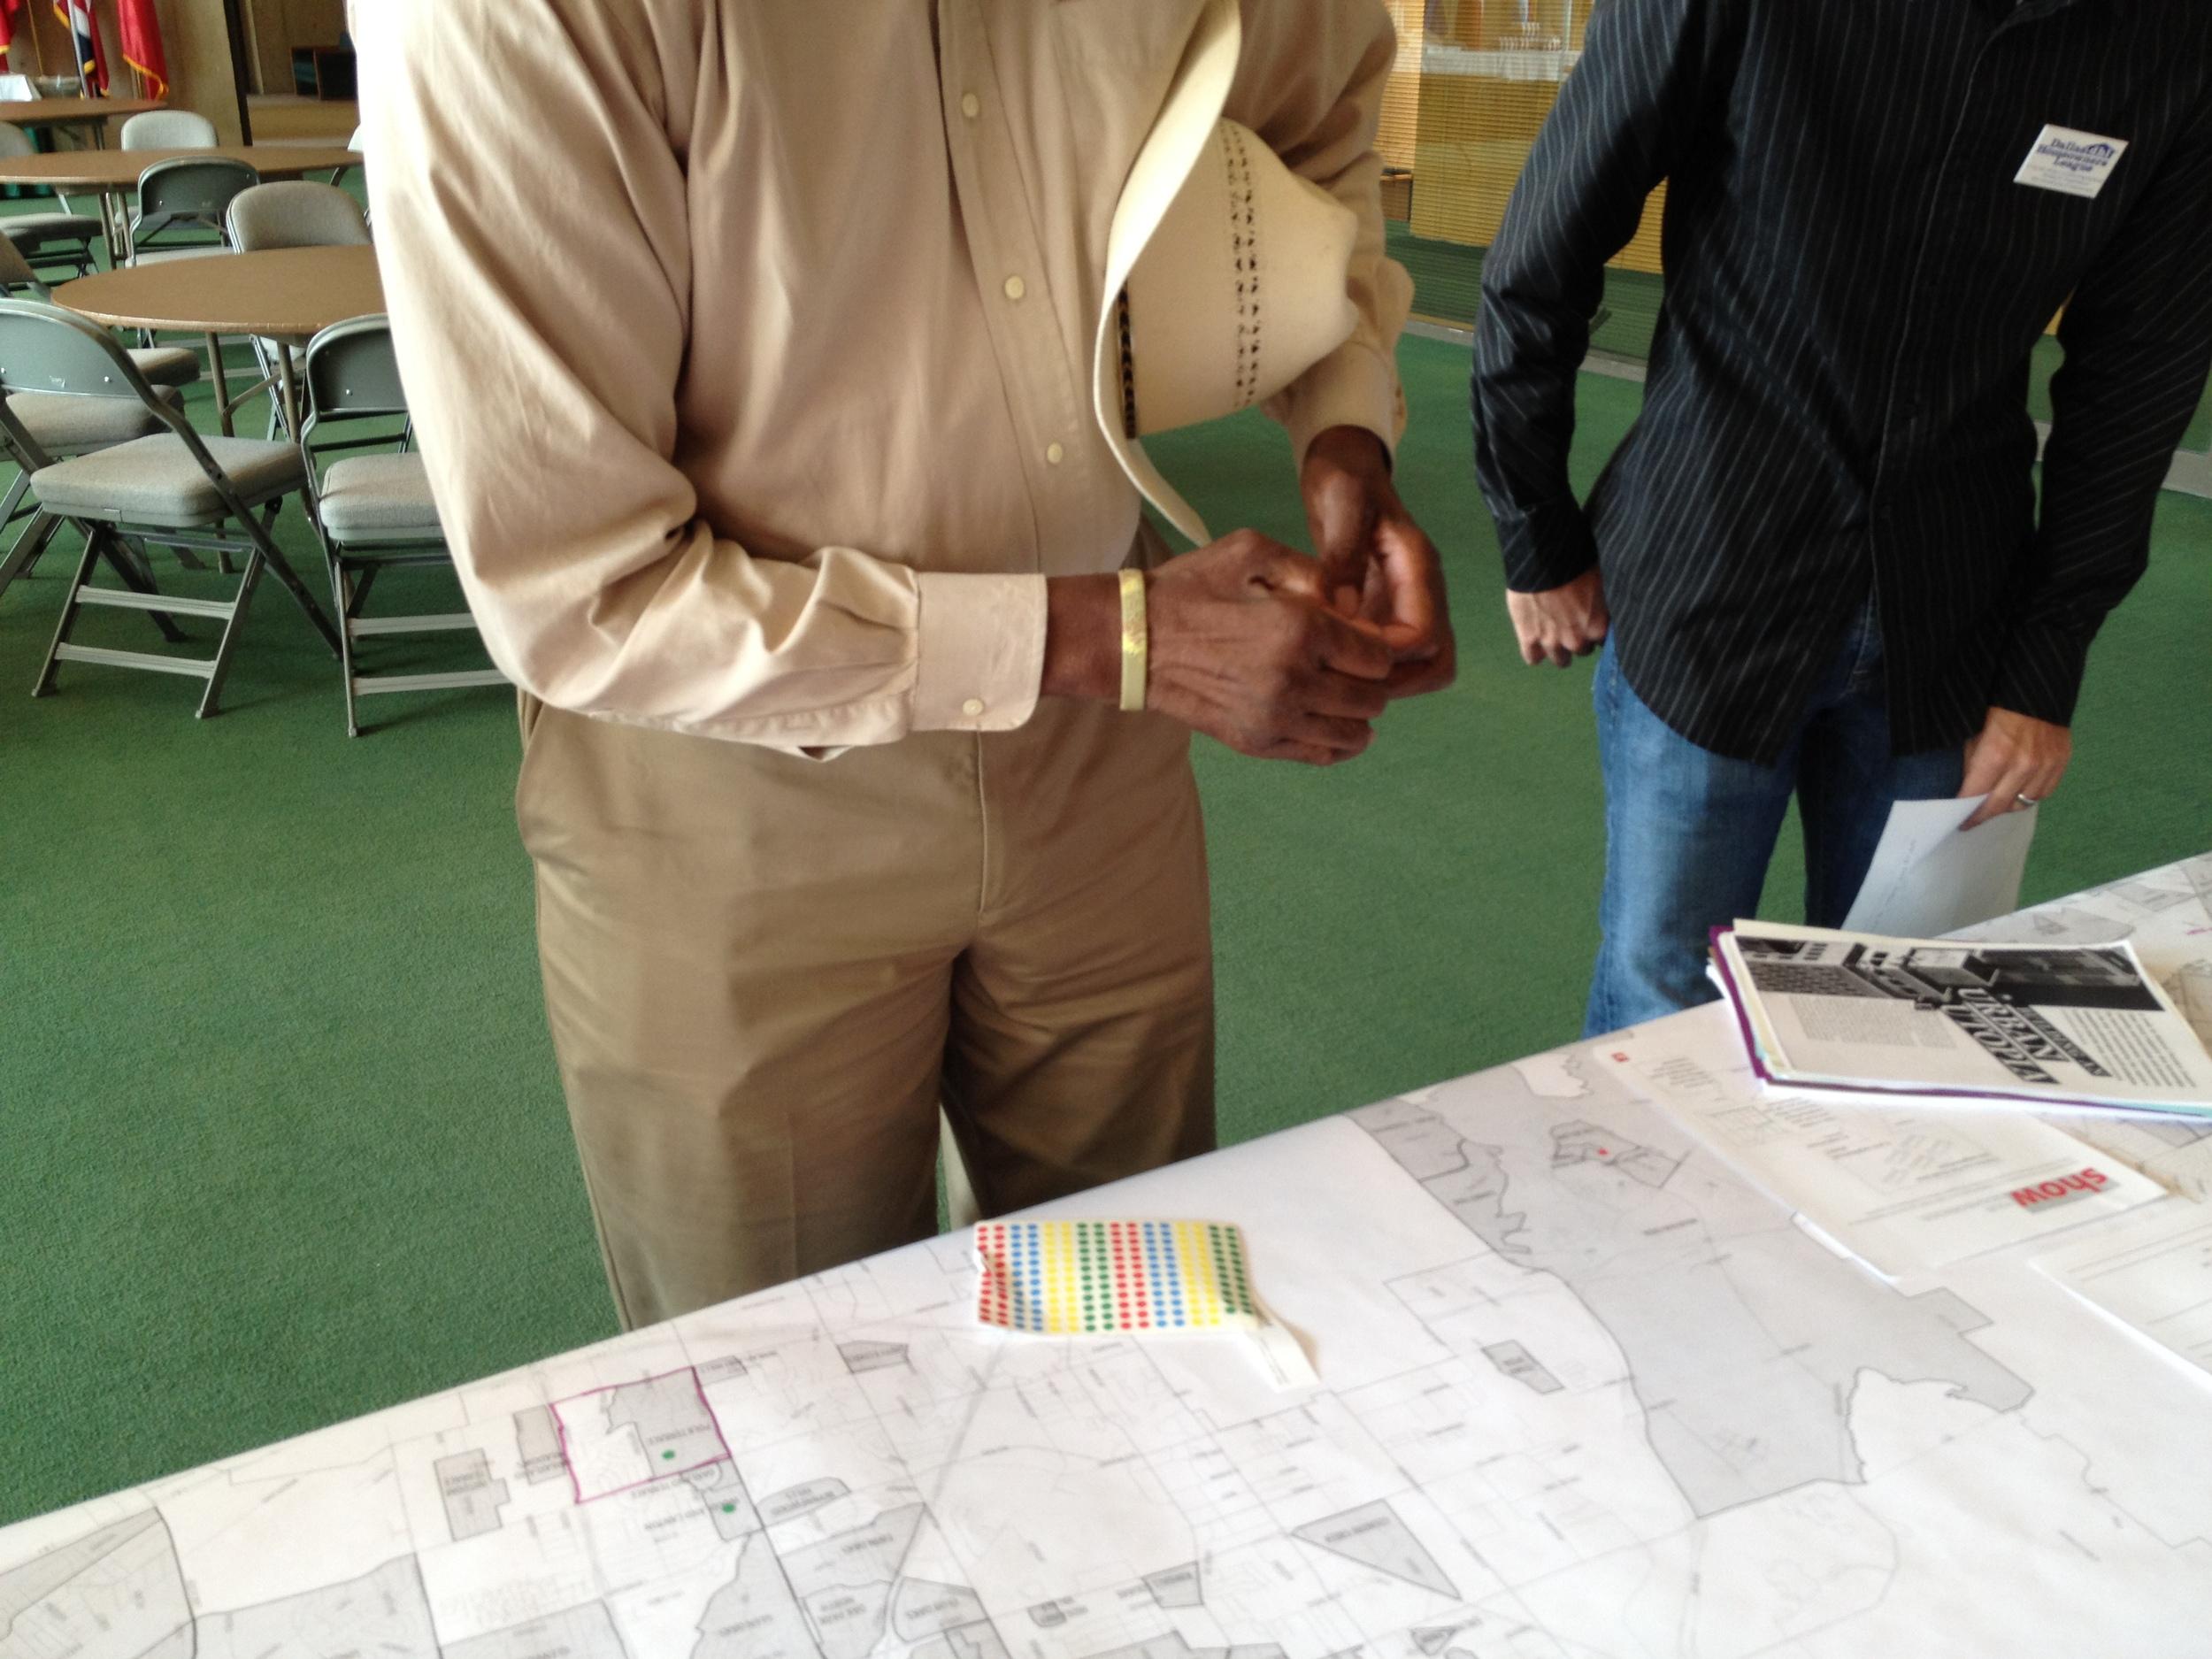 A Twin Oaks resident confirms his neighborhood's boundaries.